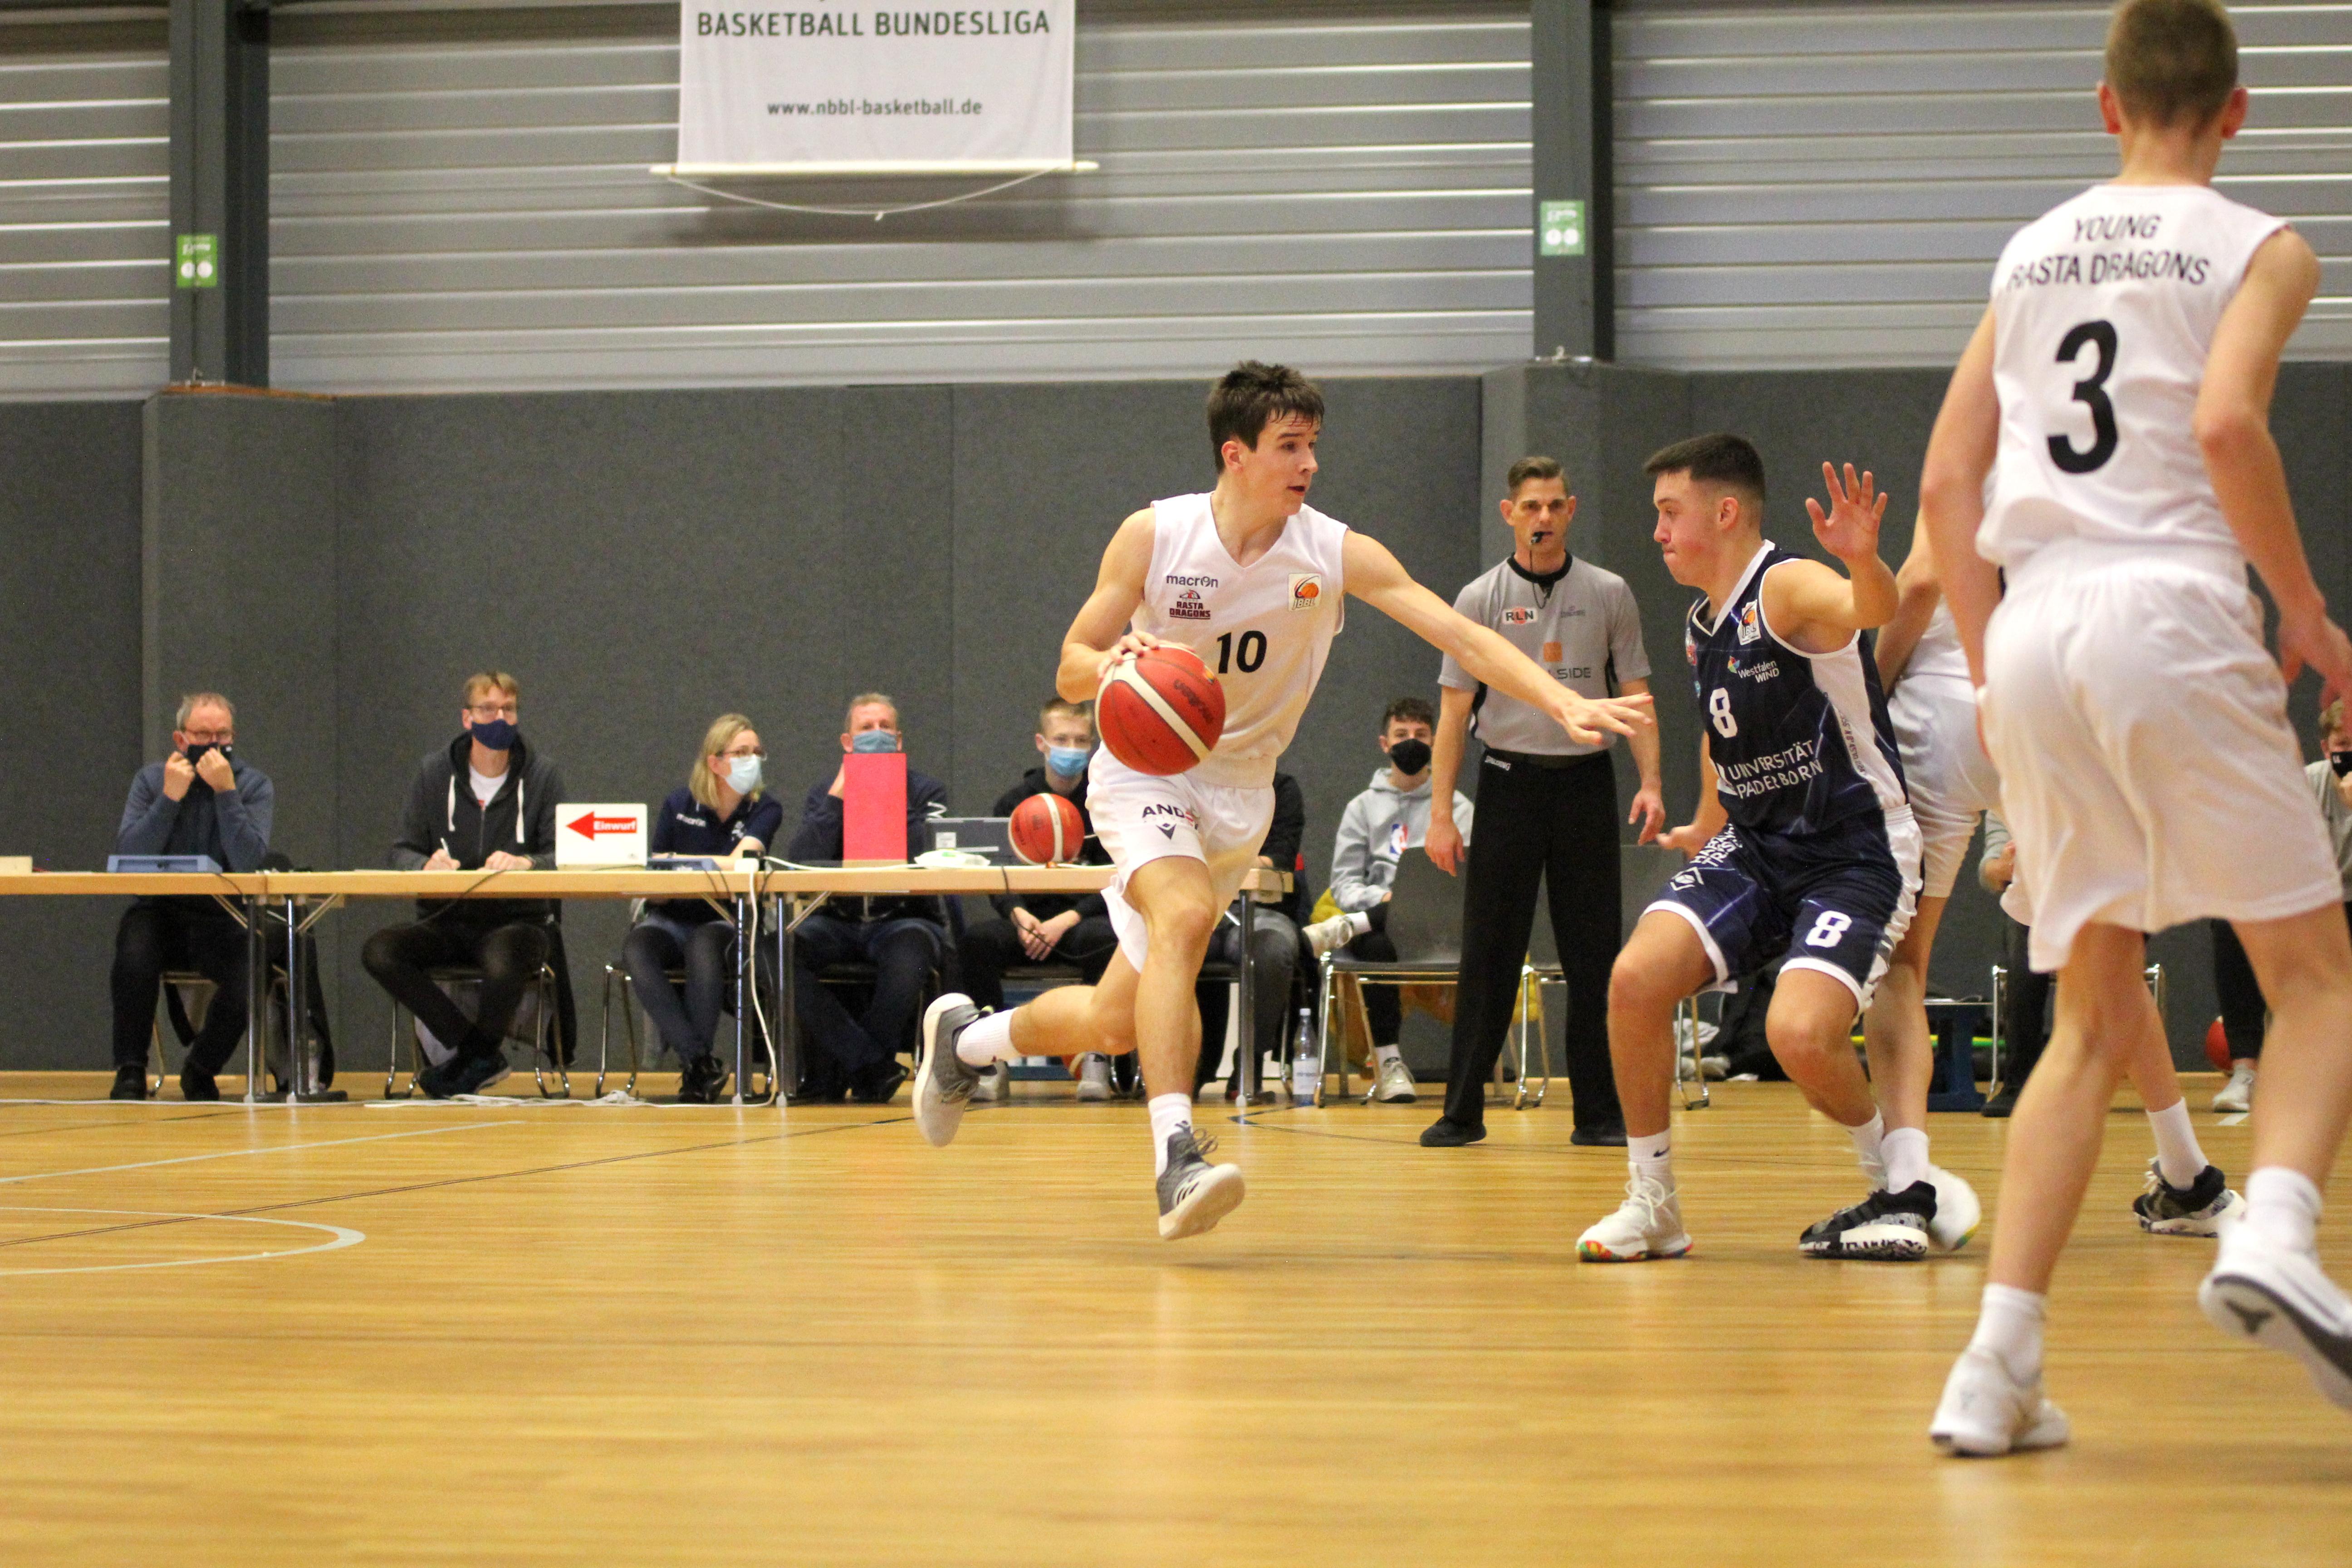 JBBL_20-21_YOUNG-RASTA-DRAGONS_Paderborn_Spieltag2_Lasse-Dresing4